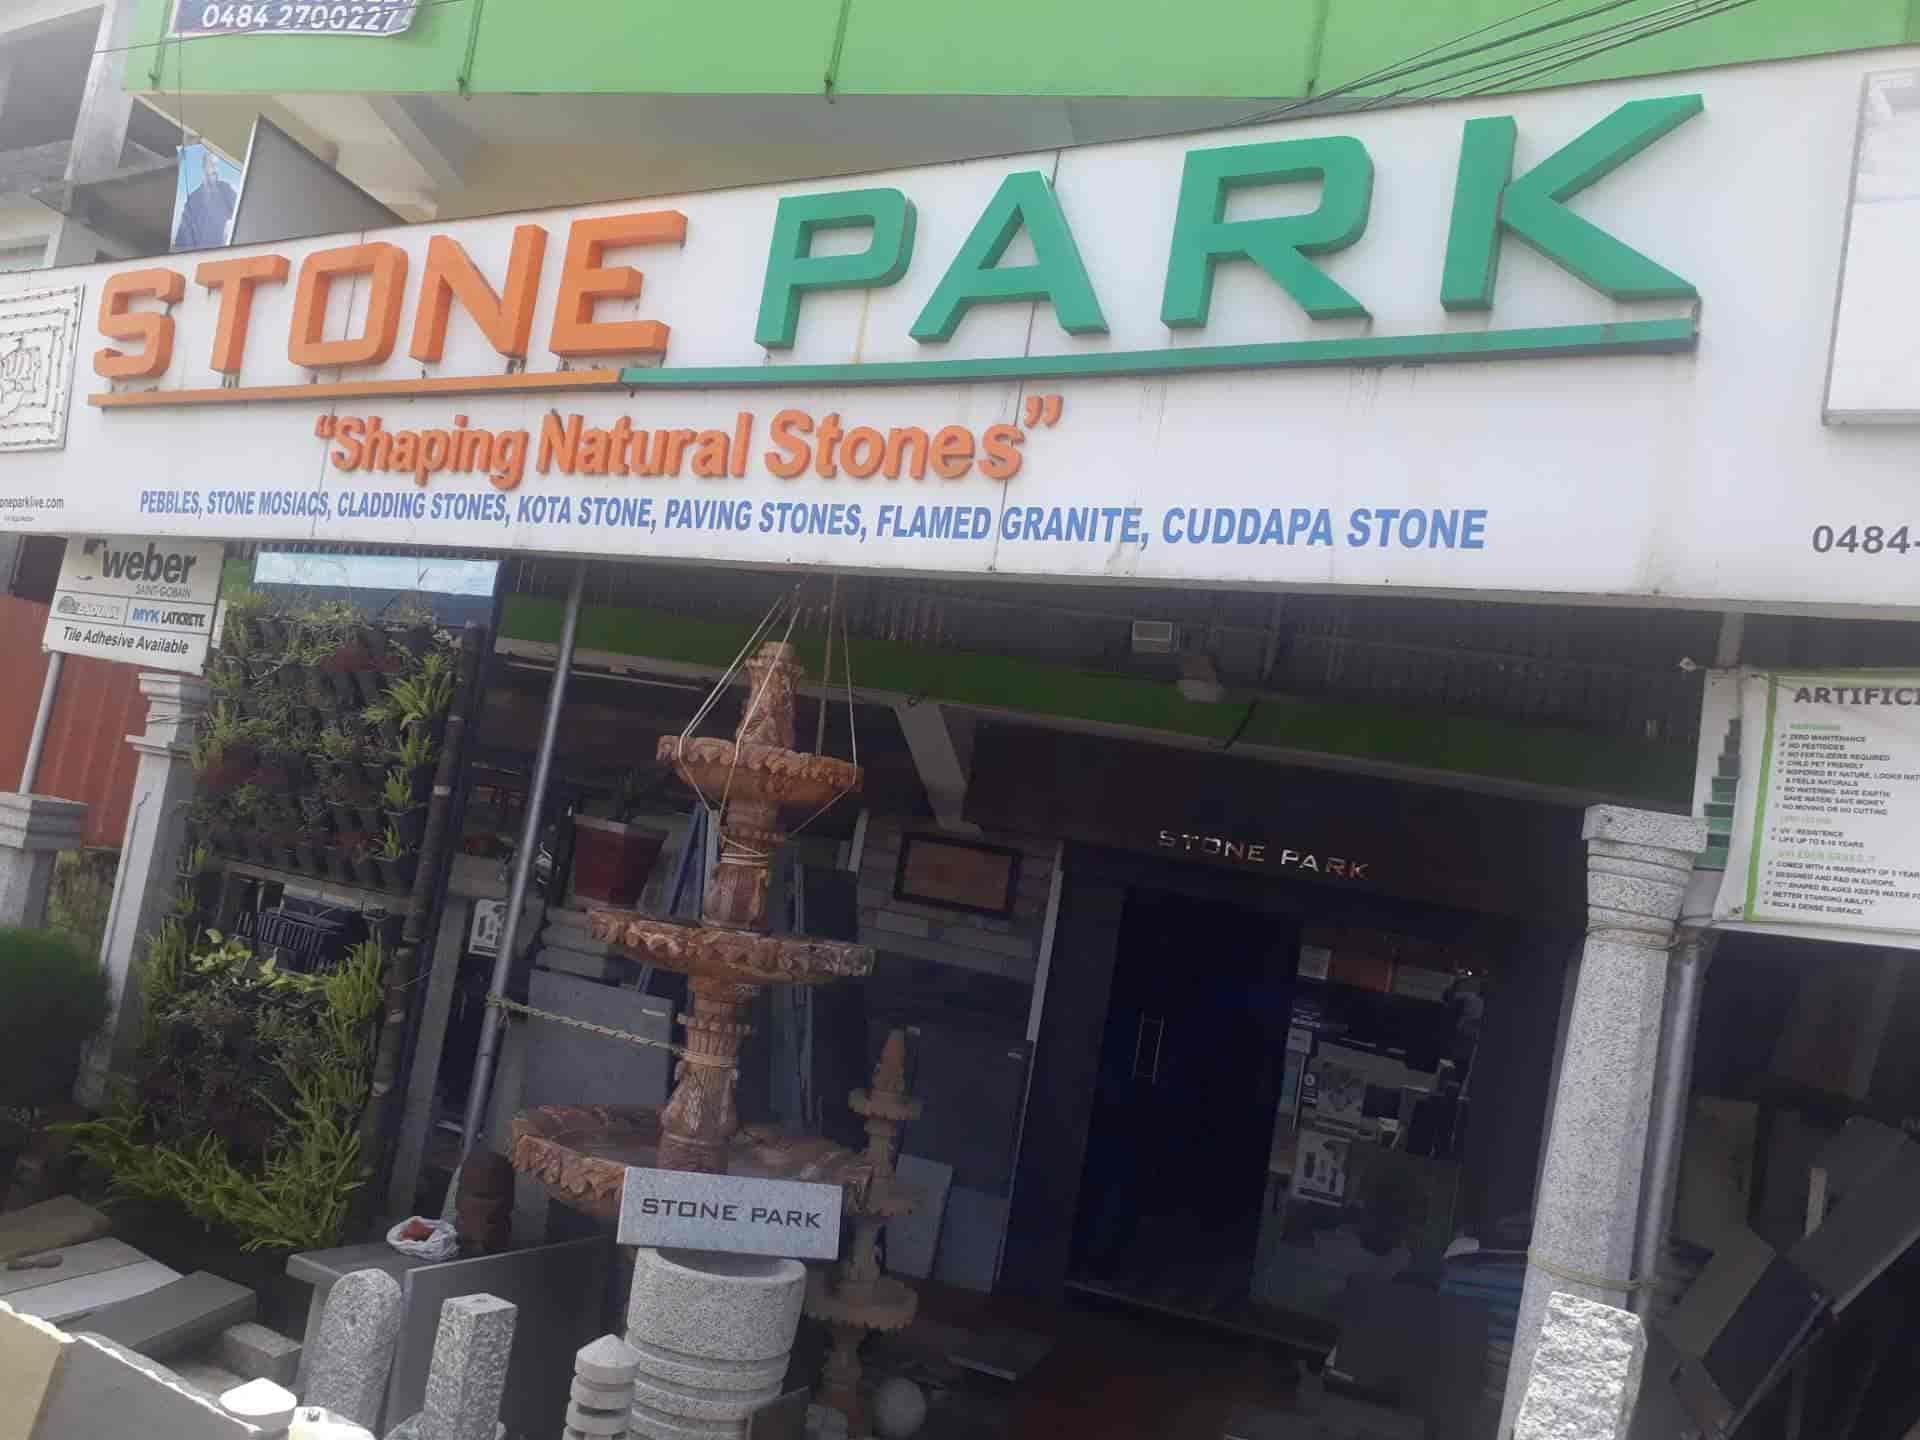 Stone Park, Nettoor - Stone Dealers in Ernakulam - Justdial